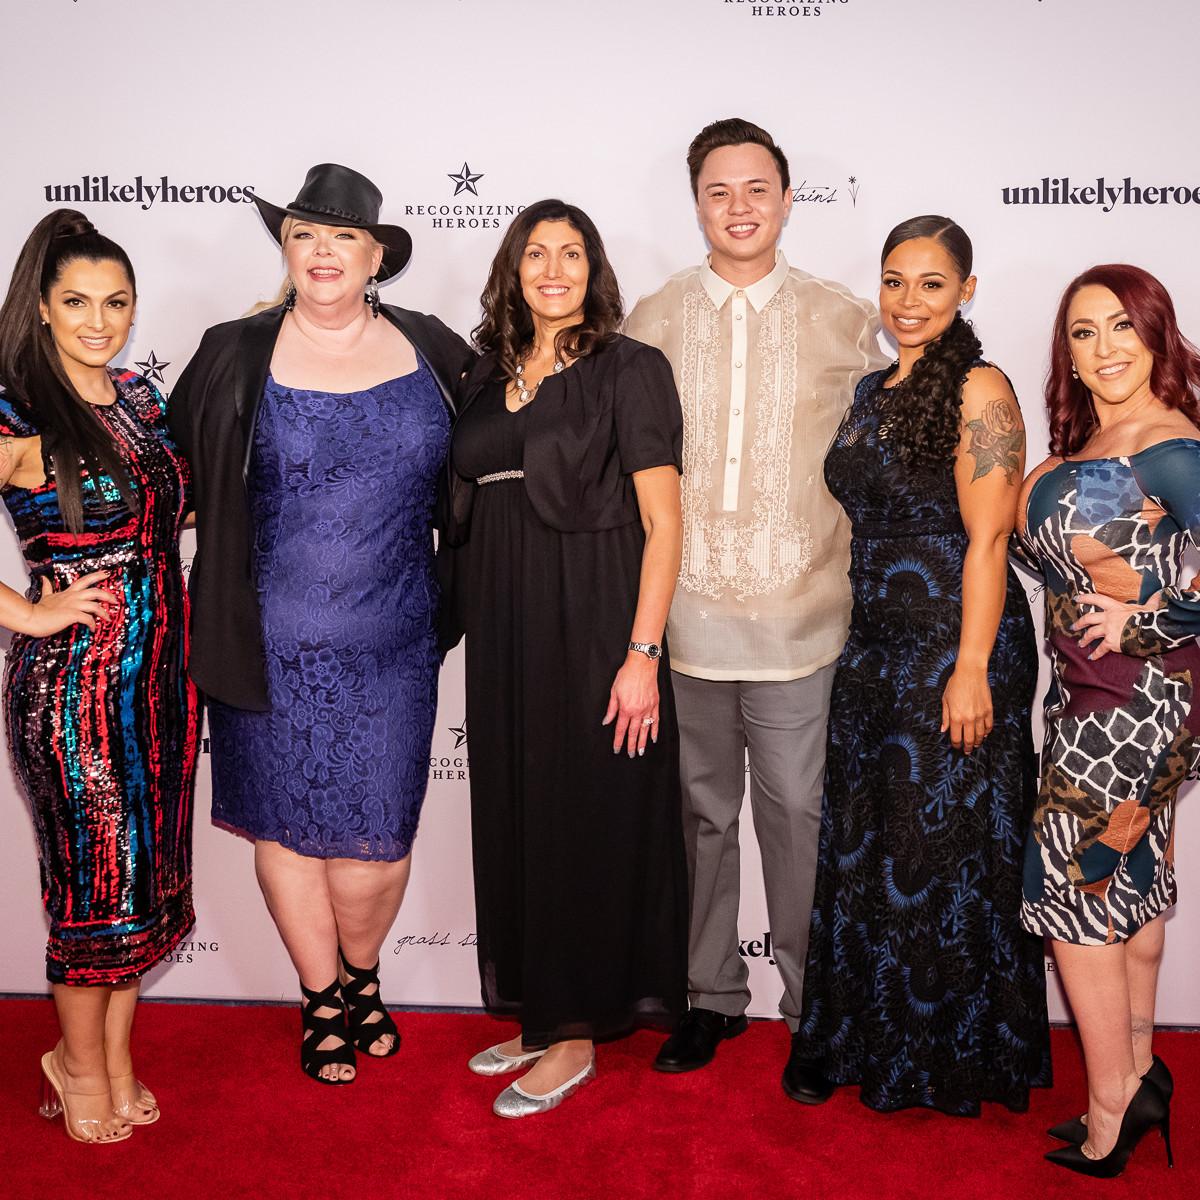 Rebecca Bender, Kathy Bryan, Jeri Moomaw, Erik Gray, Leah Albright, Rebekah Charleston